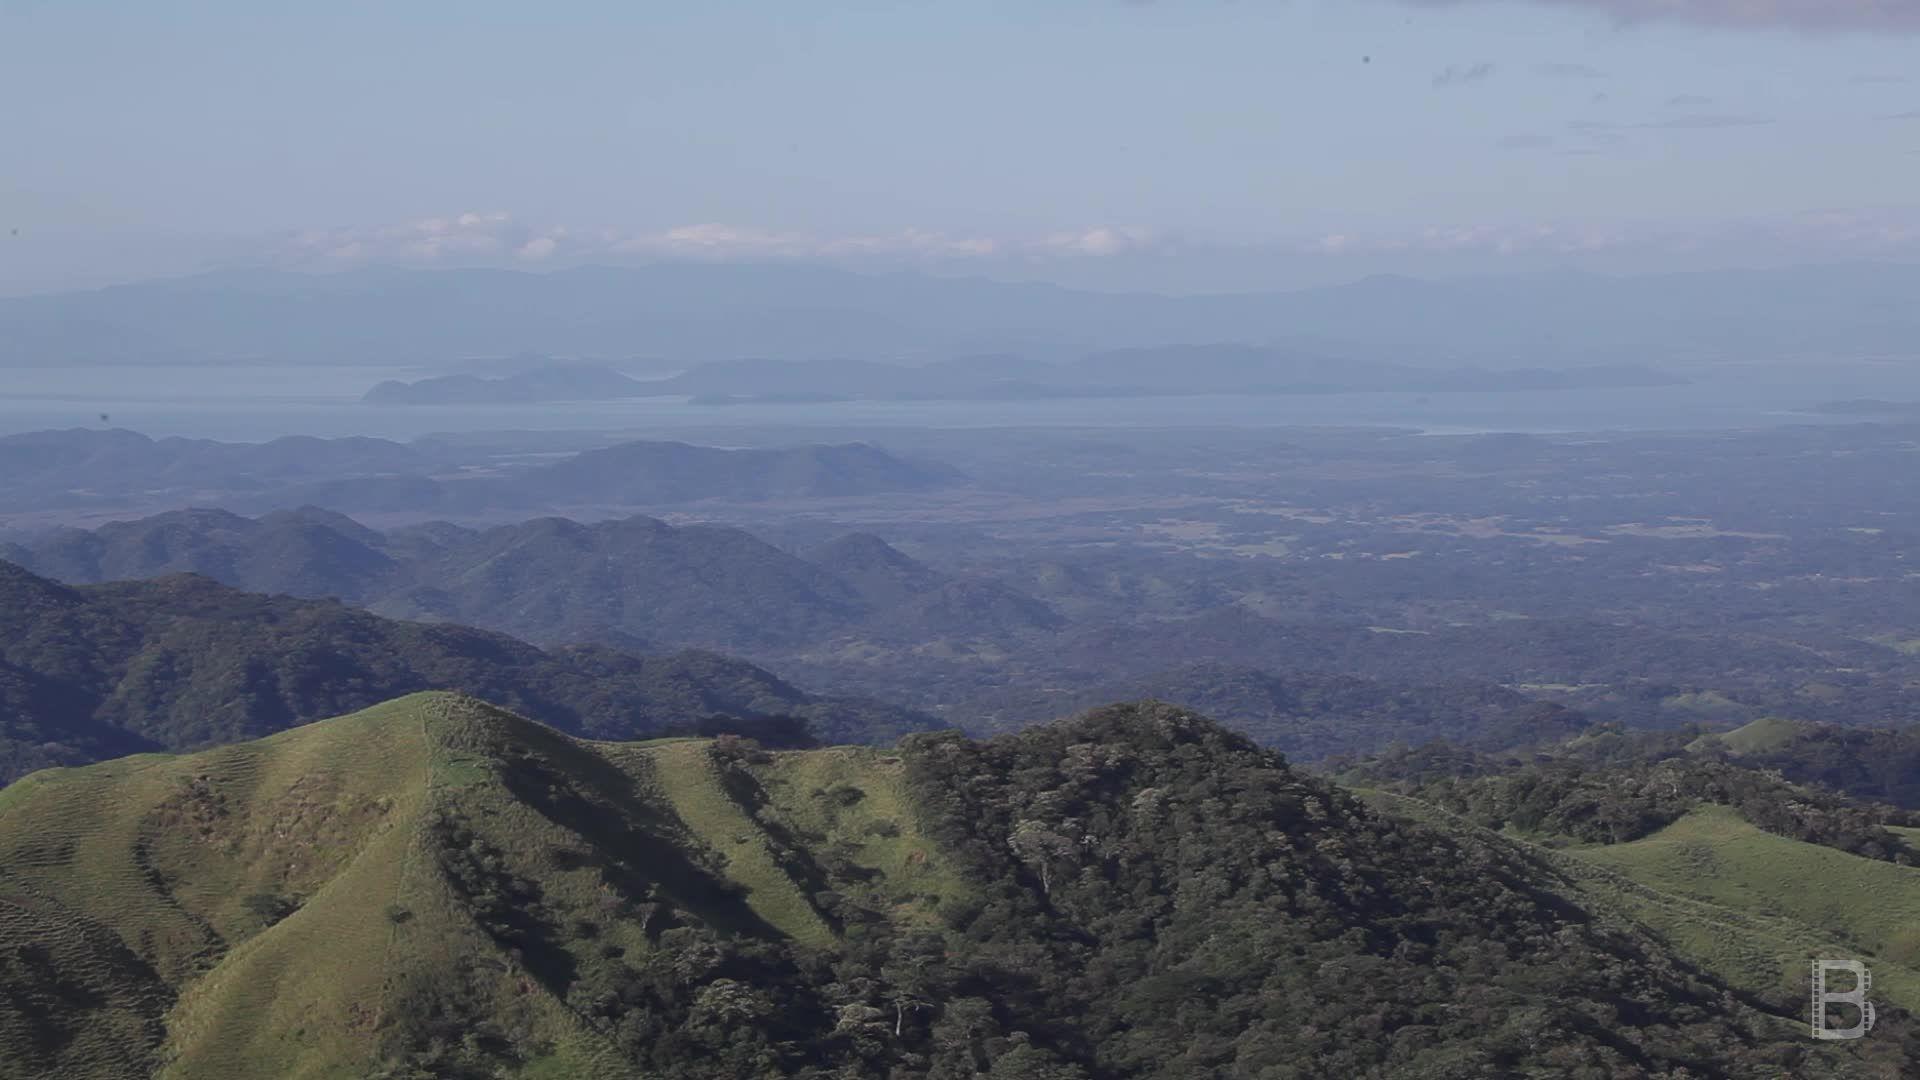 BELLA Presents: daily bello S1 Ep92 Monteverde Mountains in Costa Rica